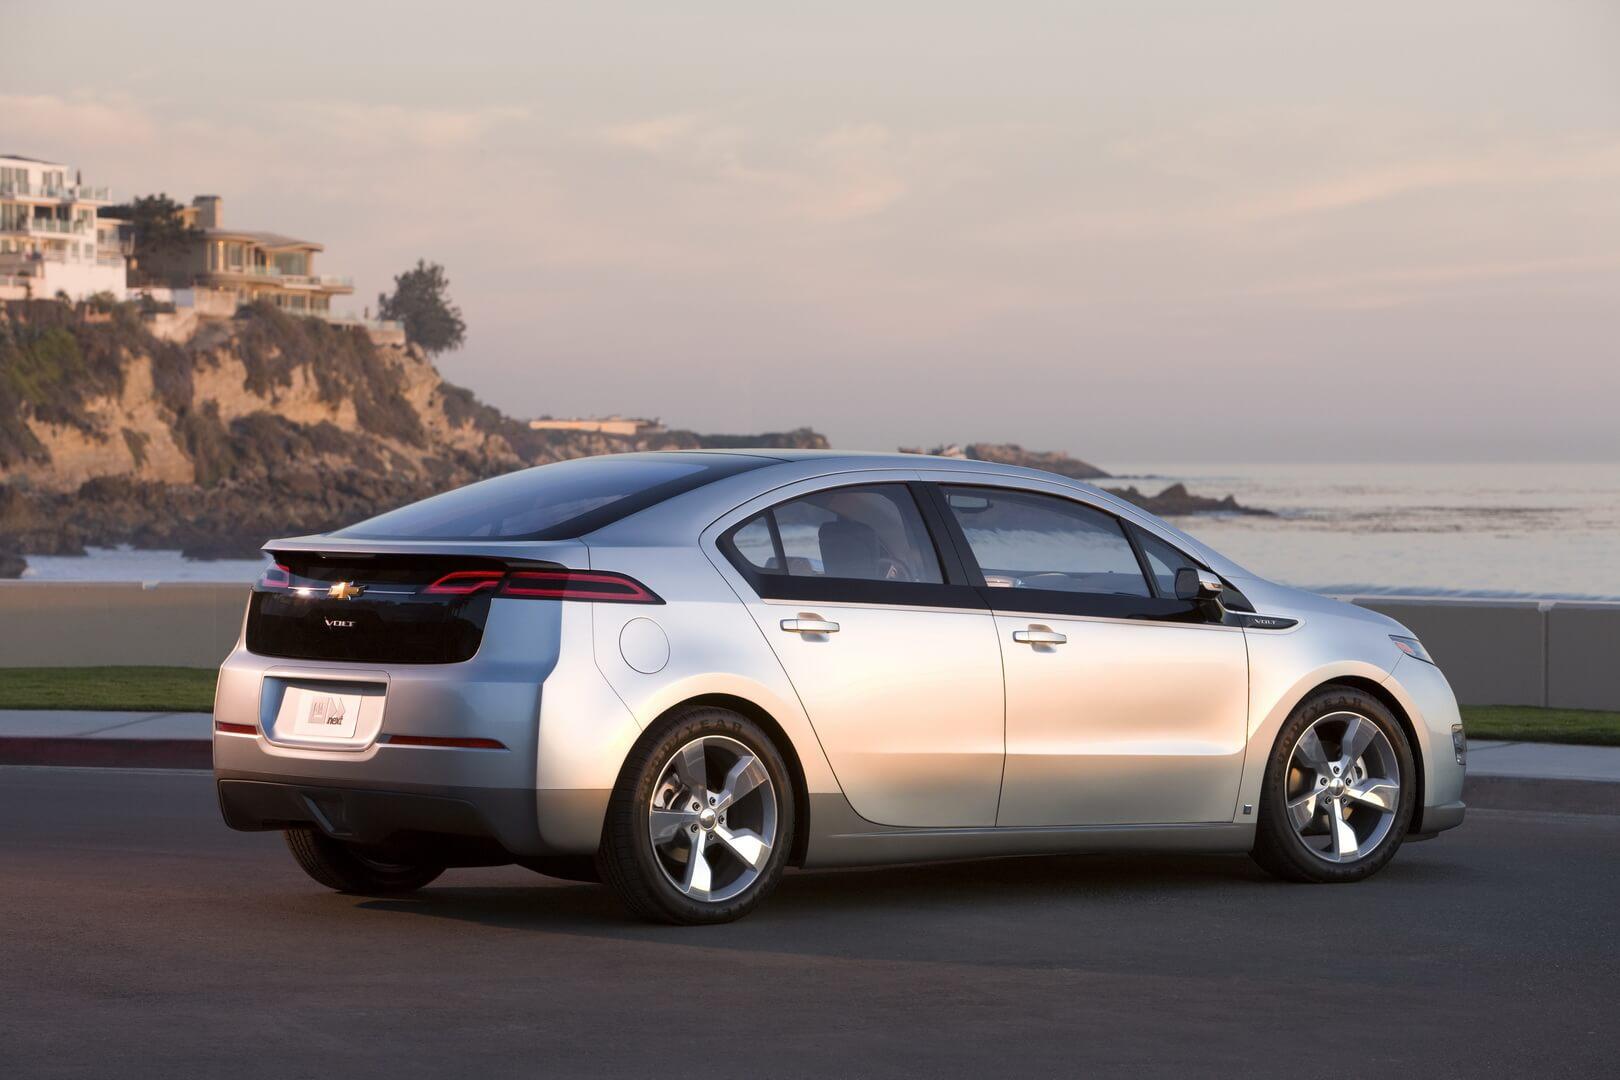 Plug-in Hybrid Chevrolet Volt 2011